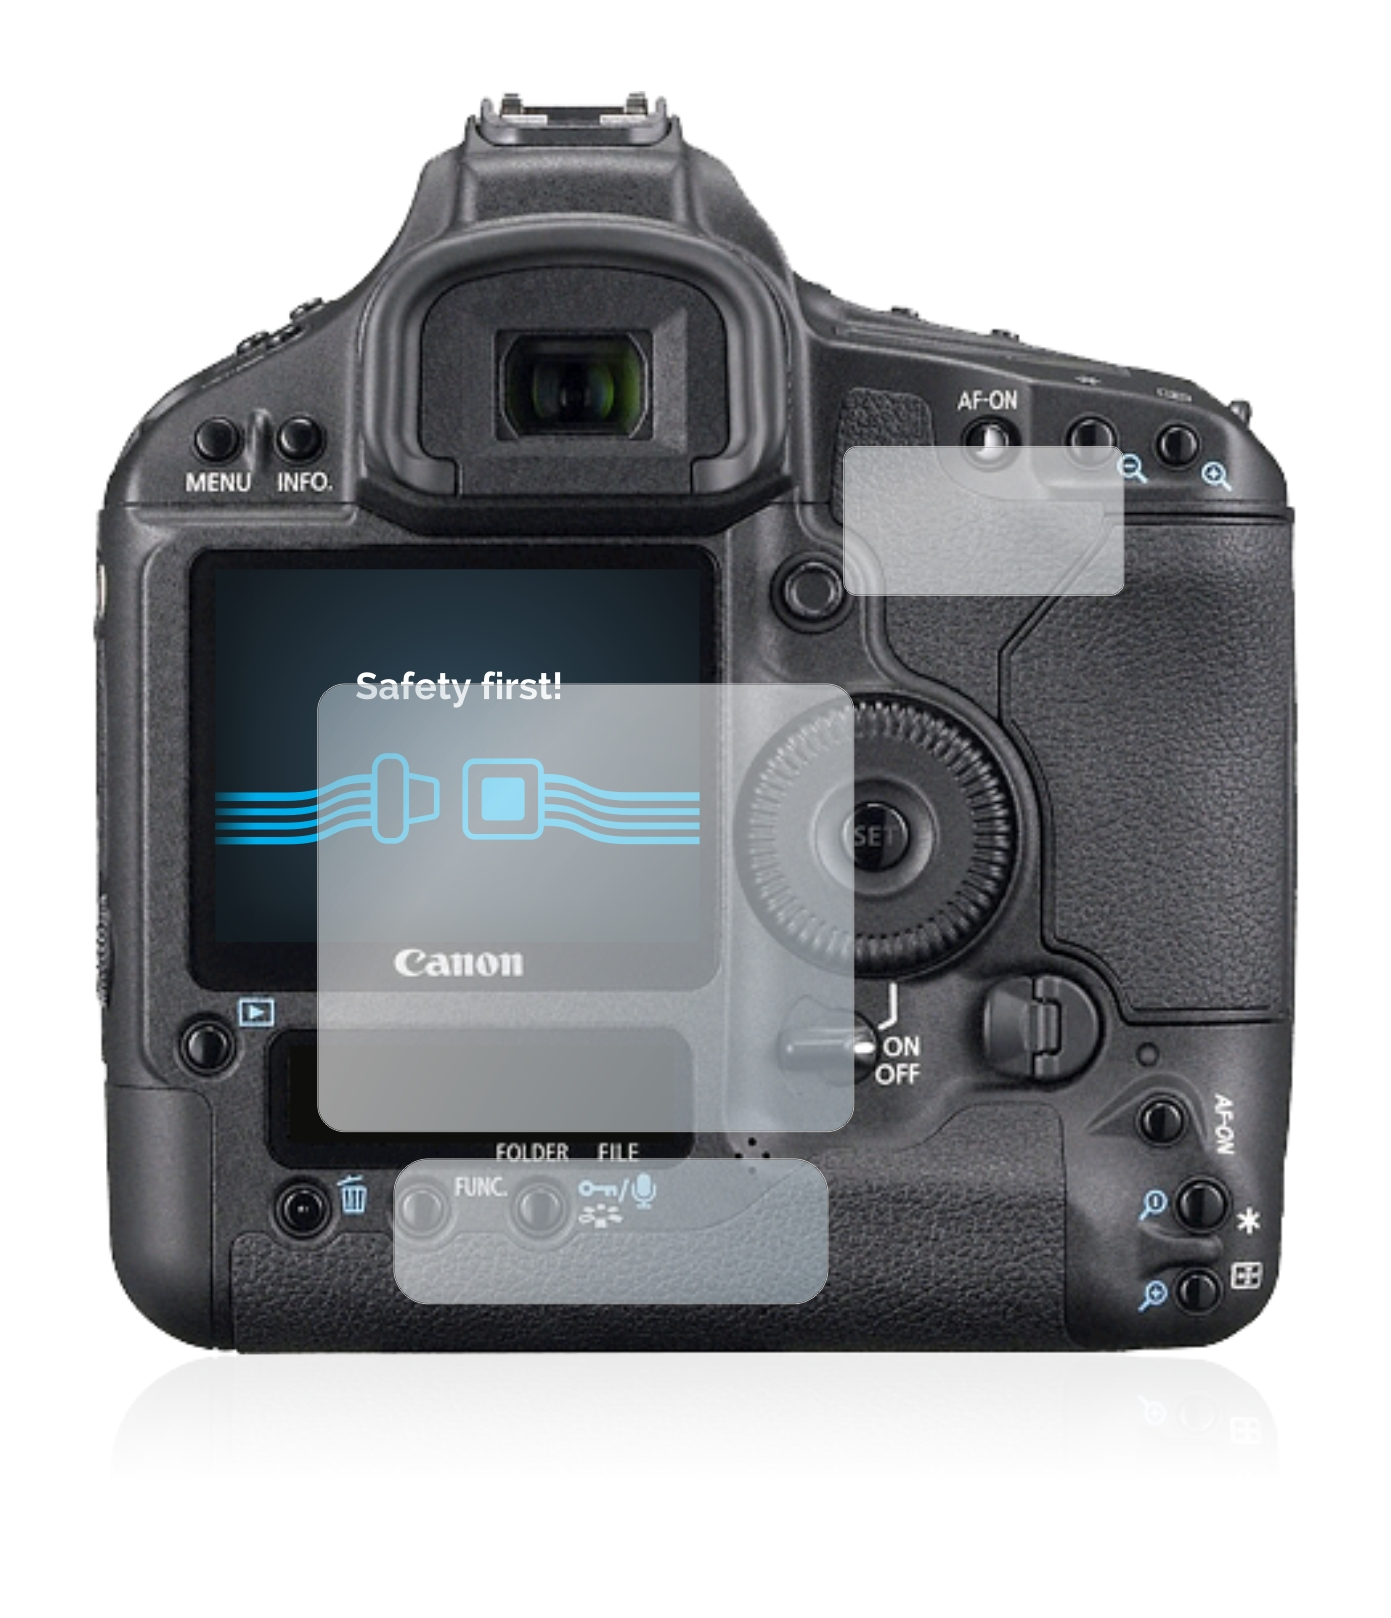 6x Savvies SU75 čirá ochranná fólie pro Canon EOS 1Ds Mark III